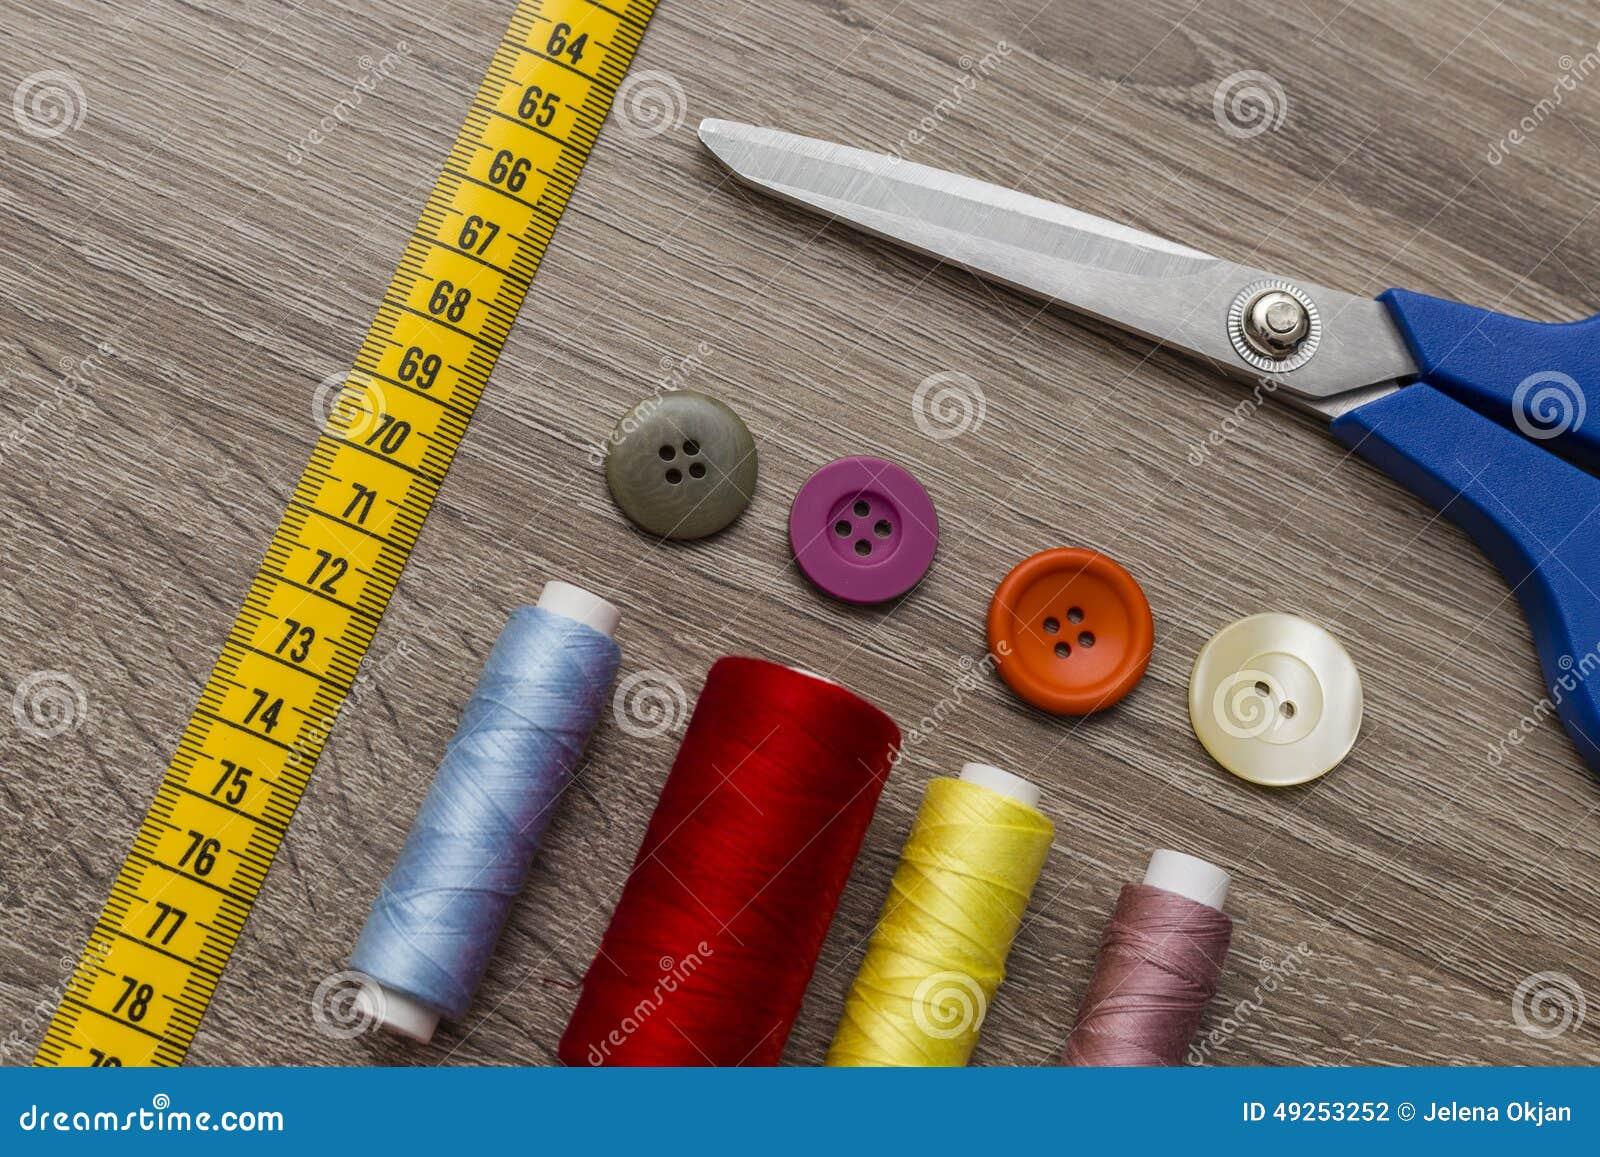 Fashion Designer Equipment Needed